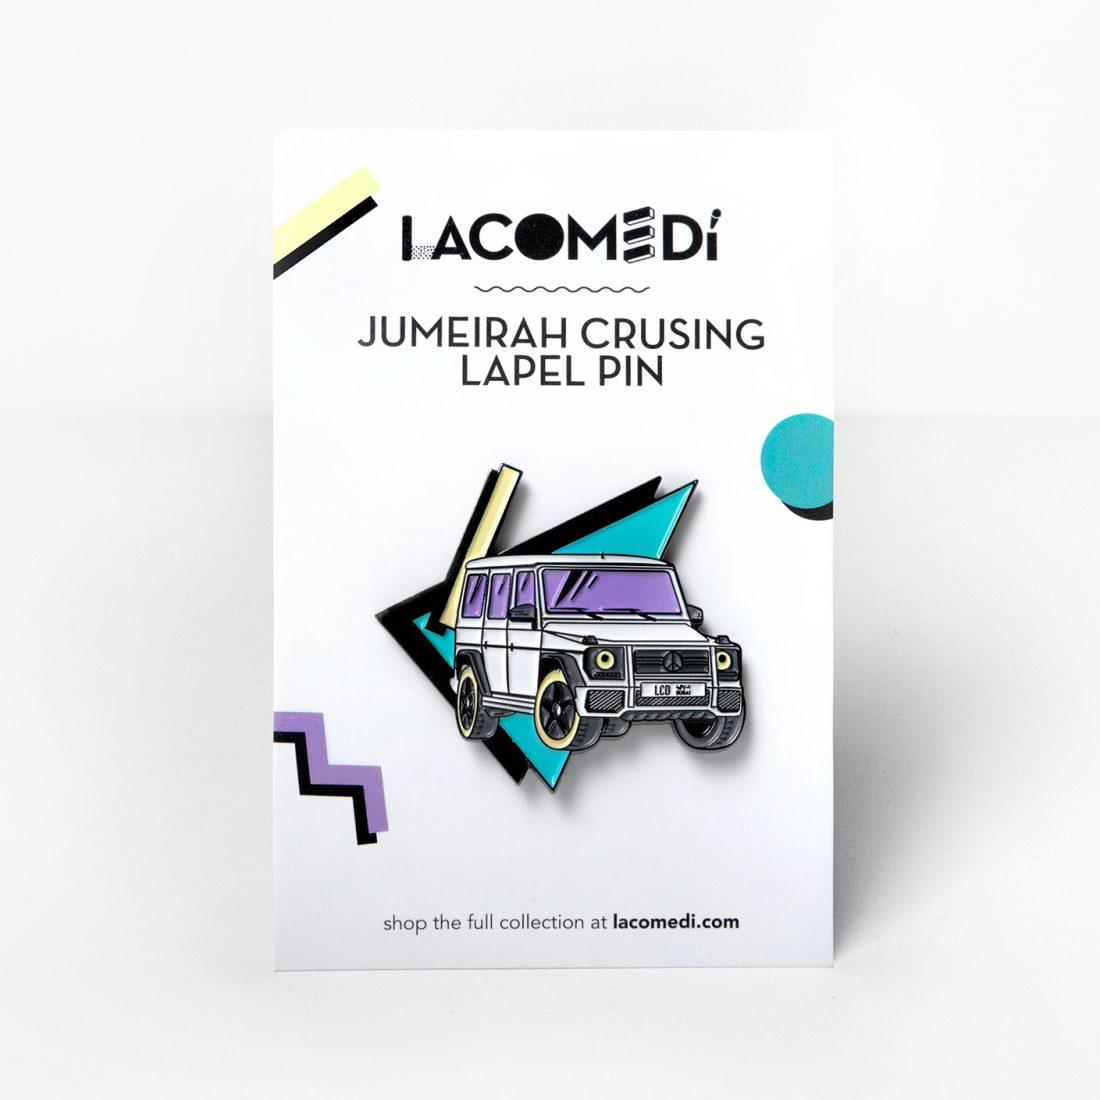 Jumeirah Cruising Pin by La come Di